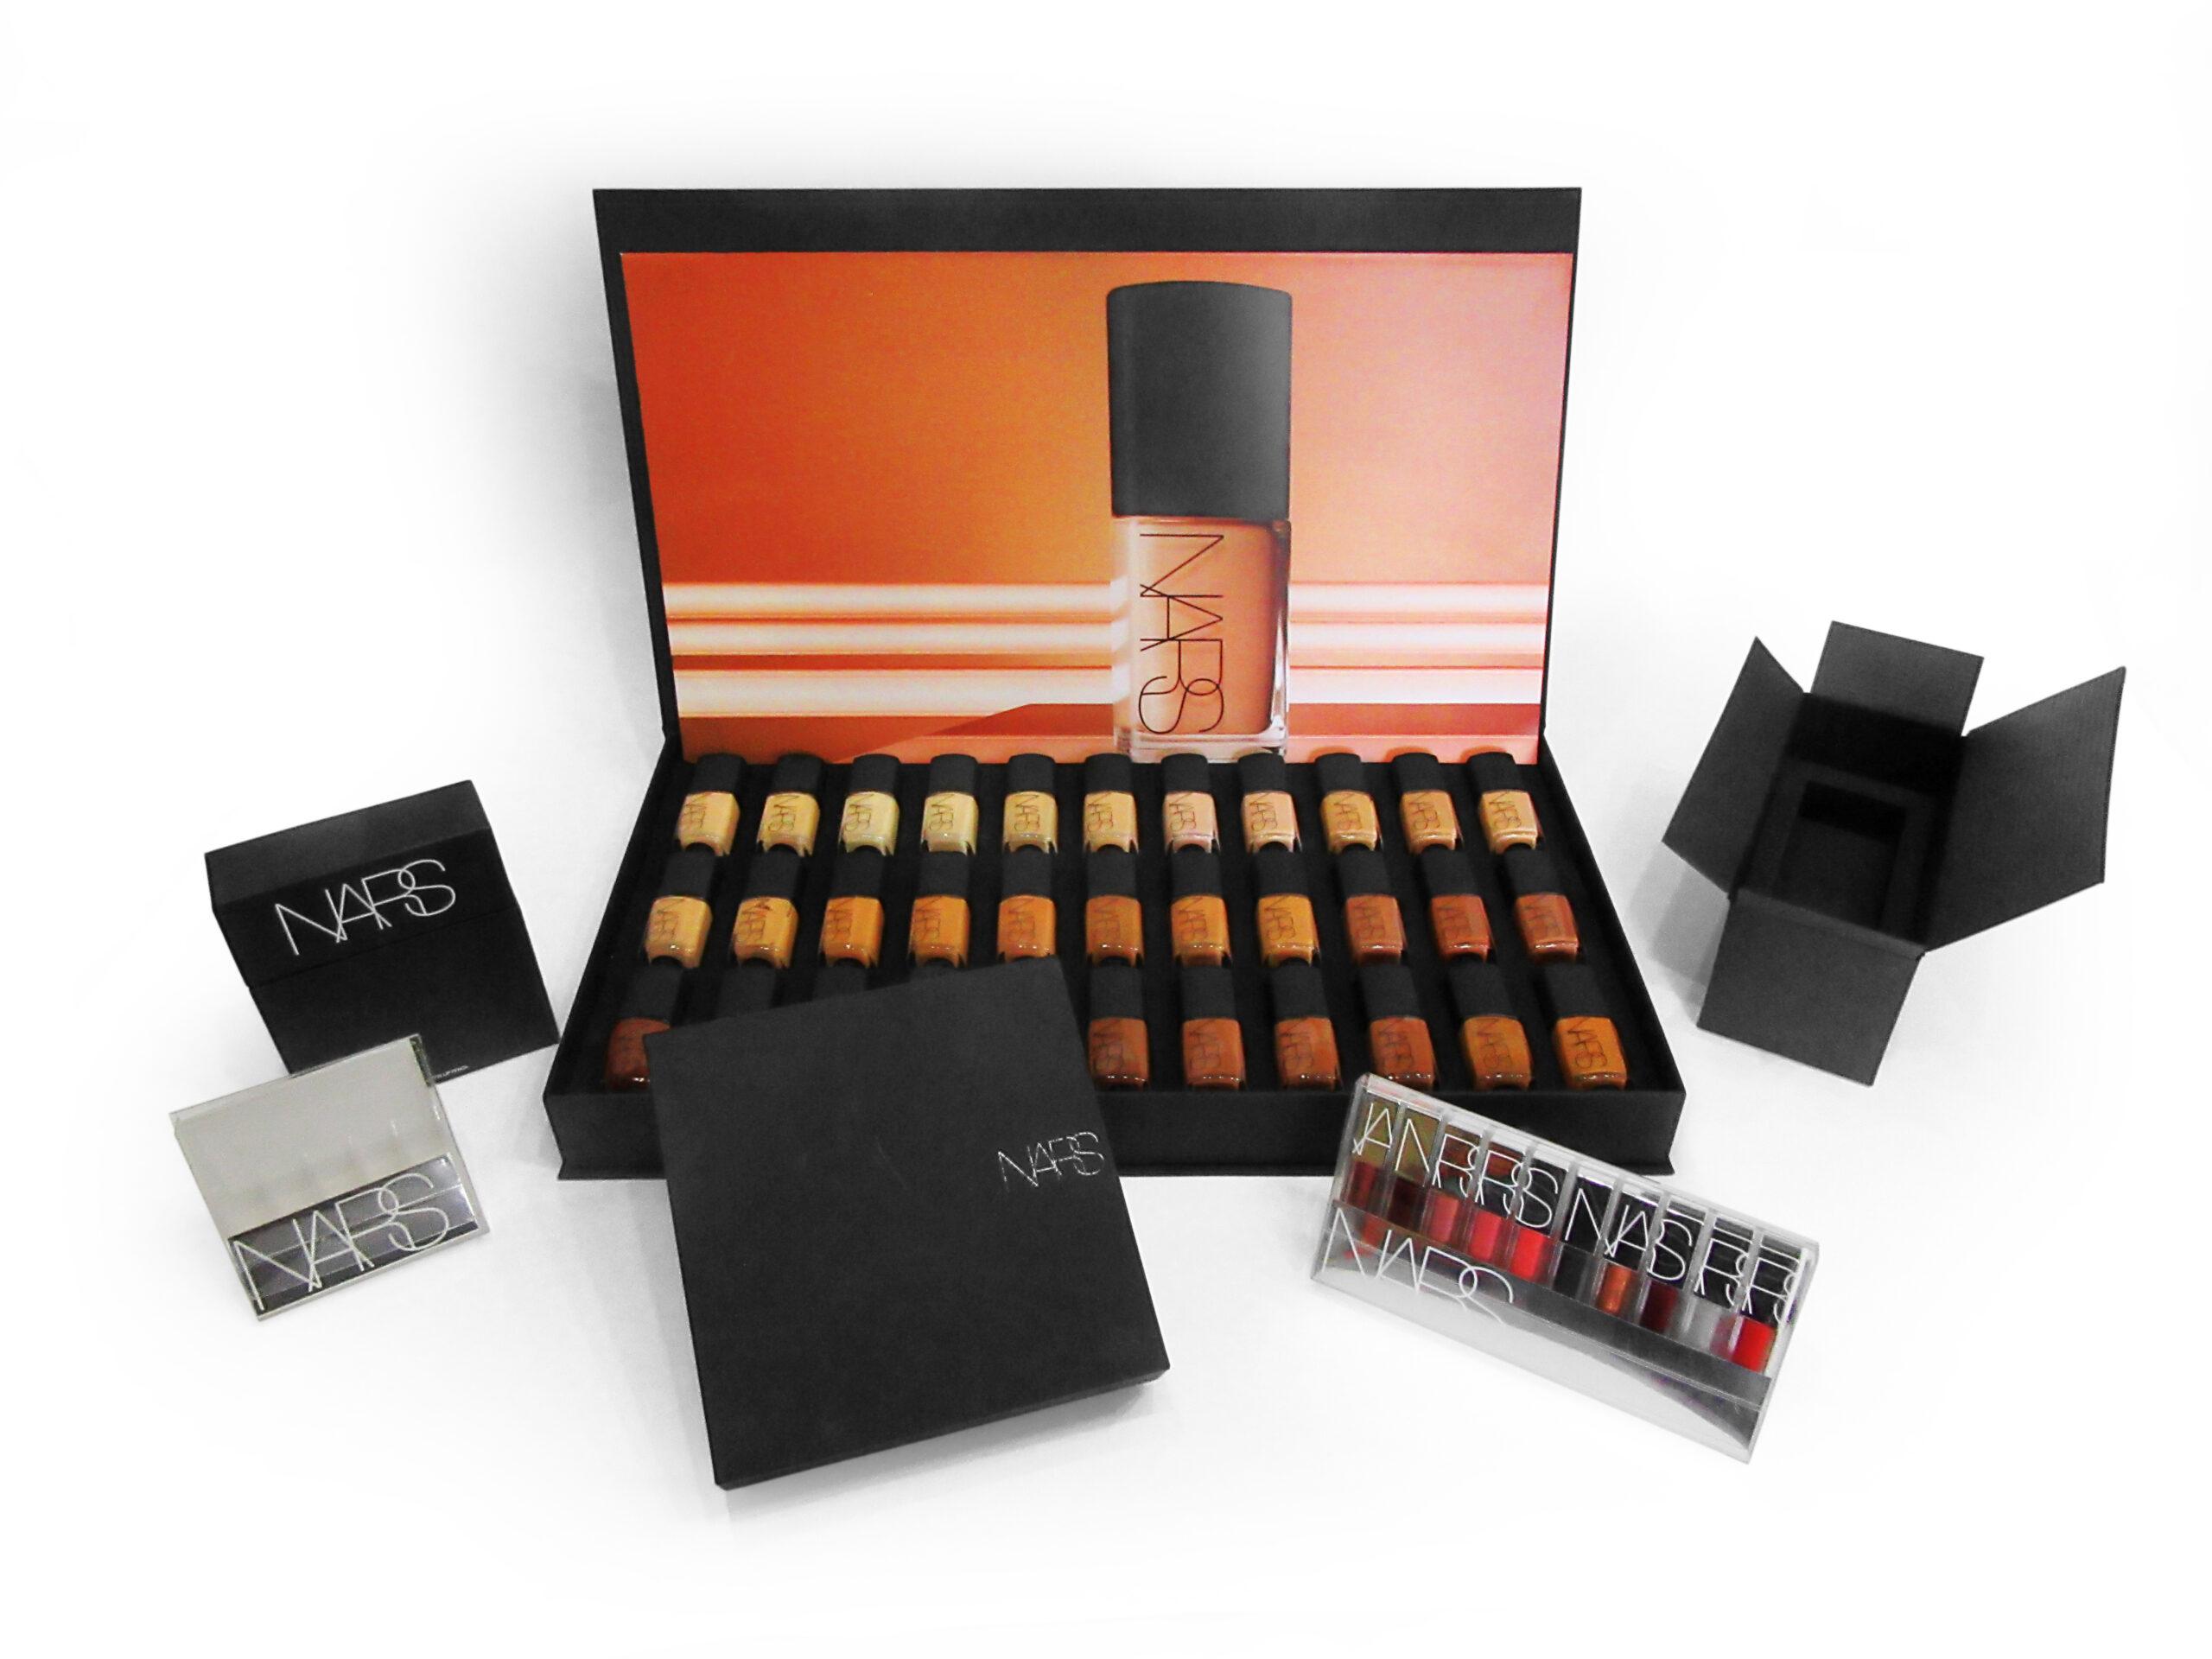 NARS Cosmetics - Custom Packaging and Design